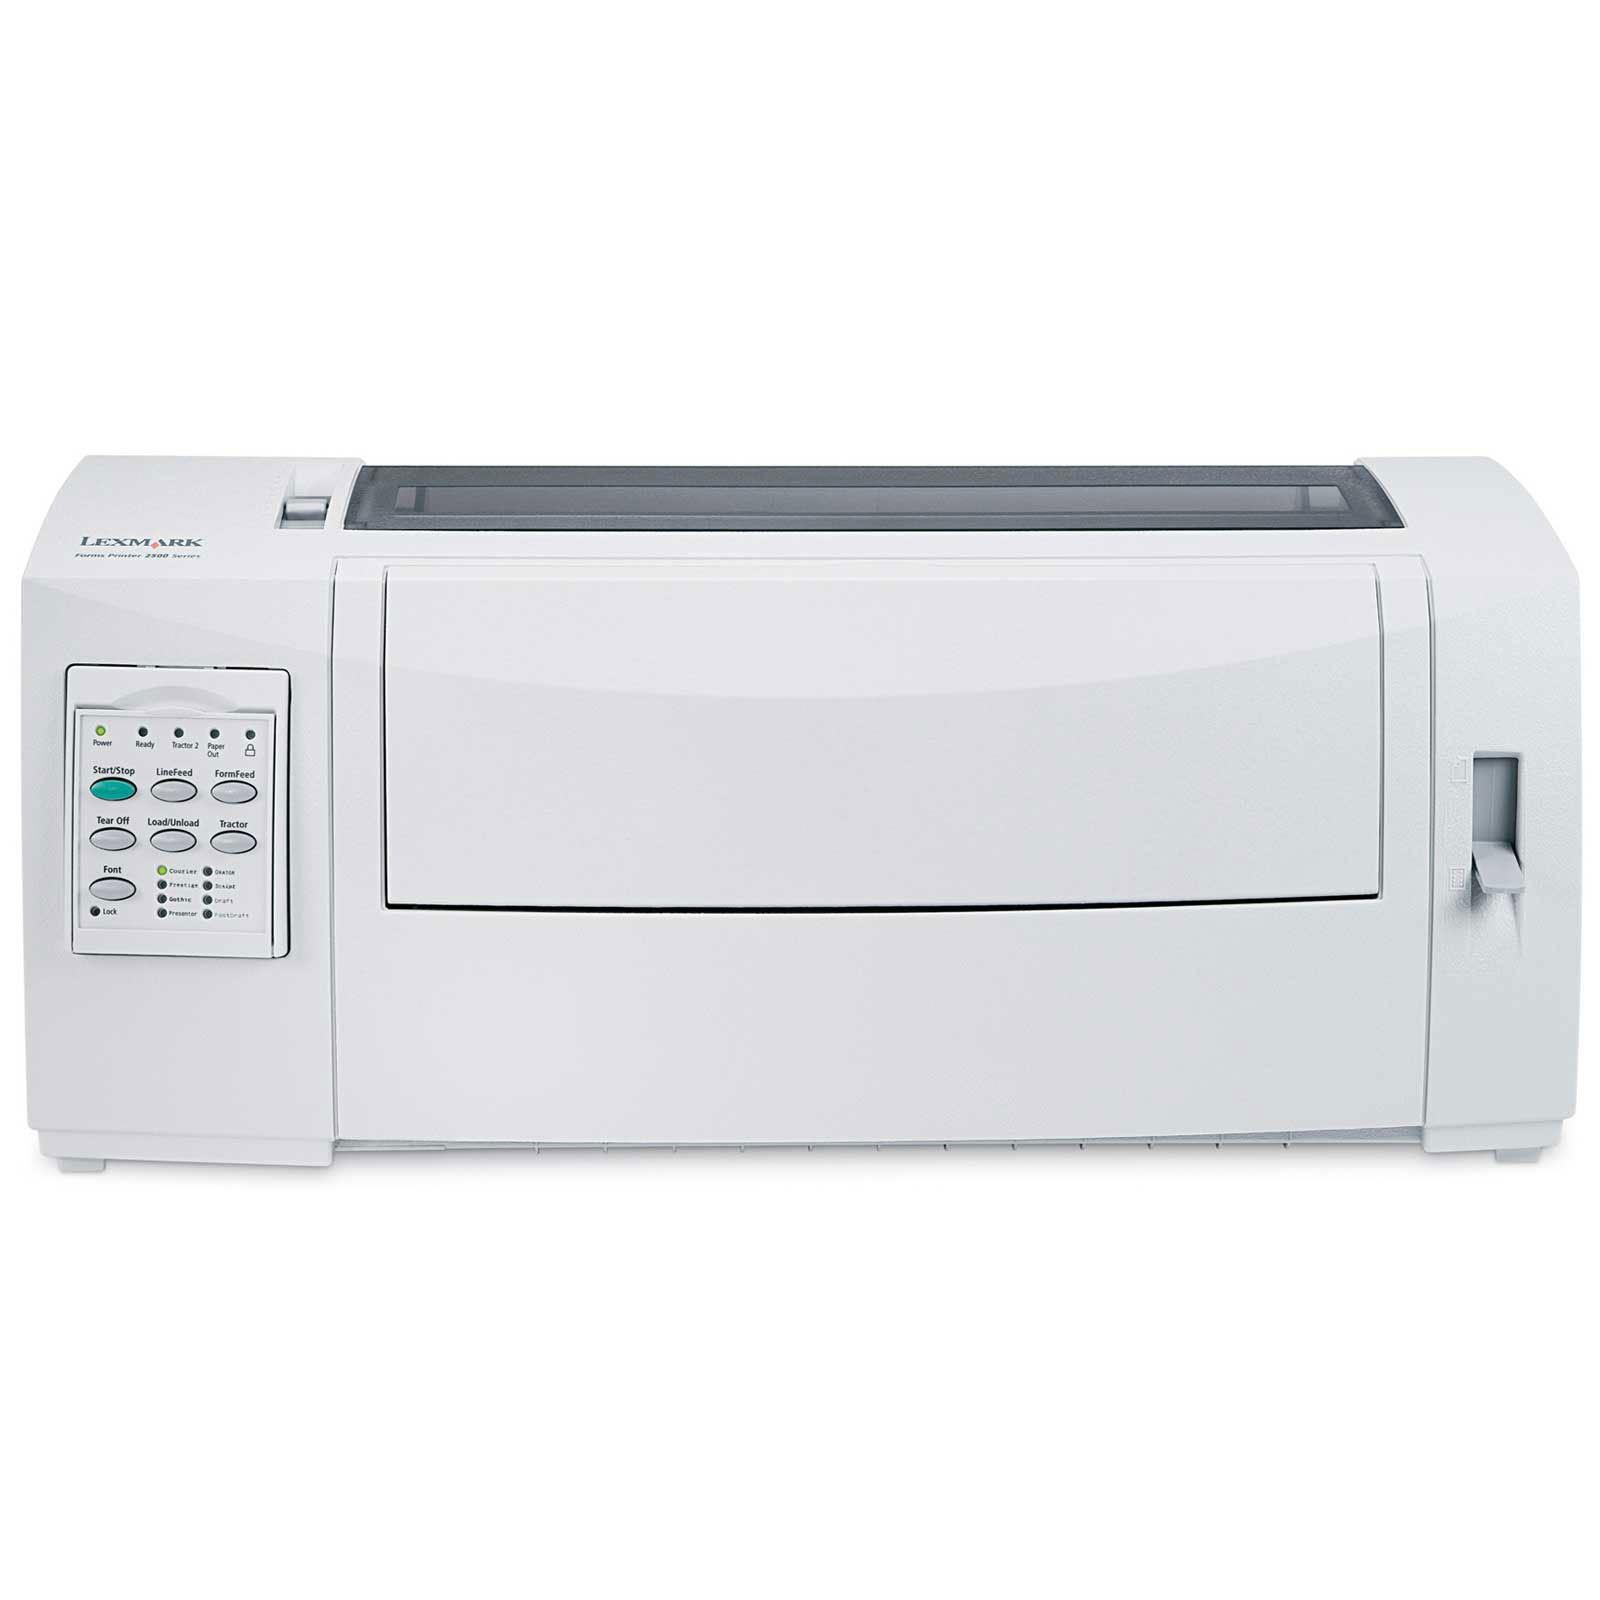 Inkjet Printers Lexmark 2590N Dot Matrix Printer